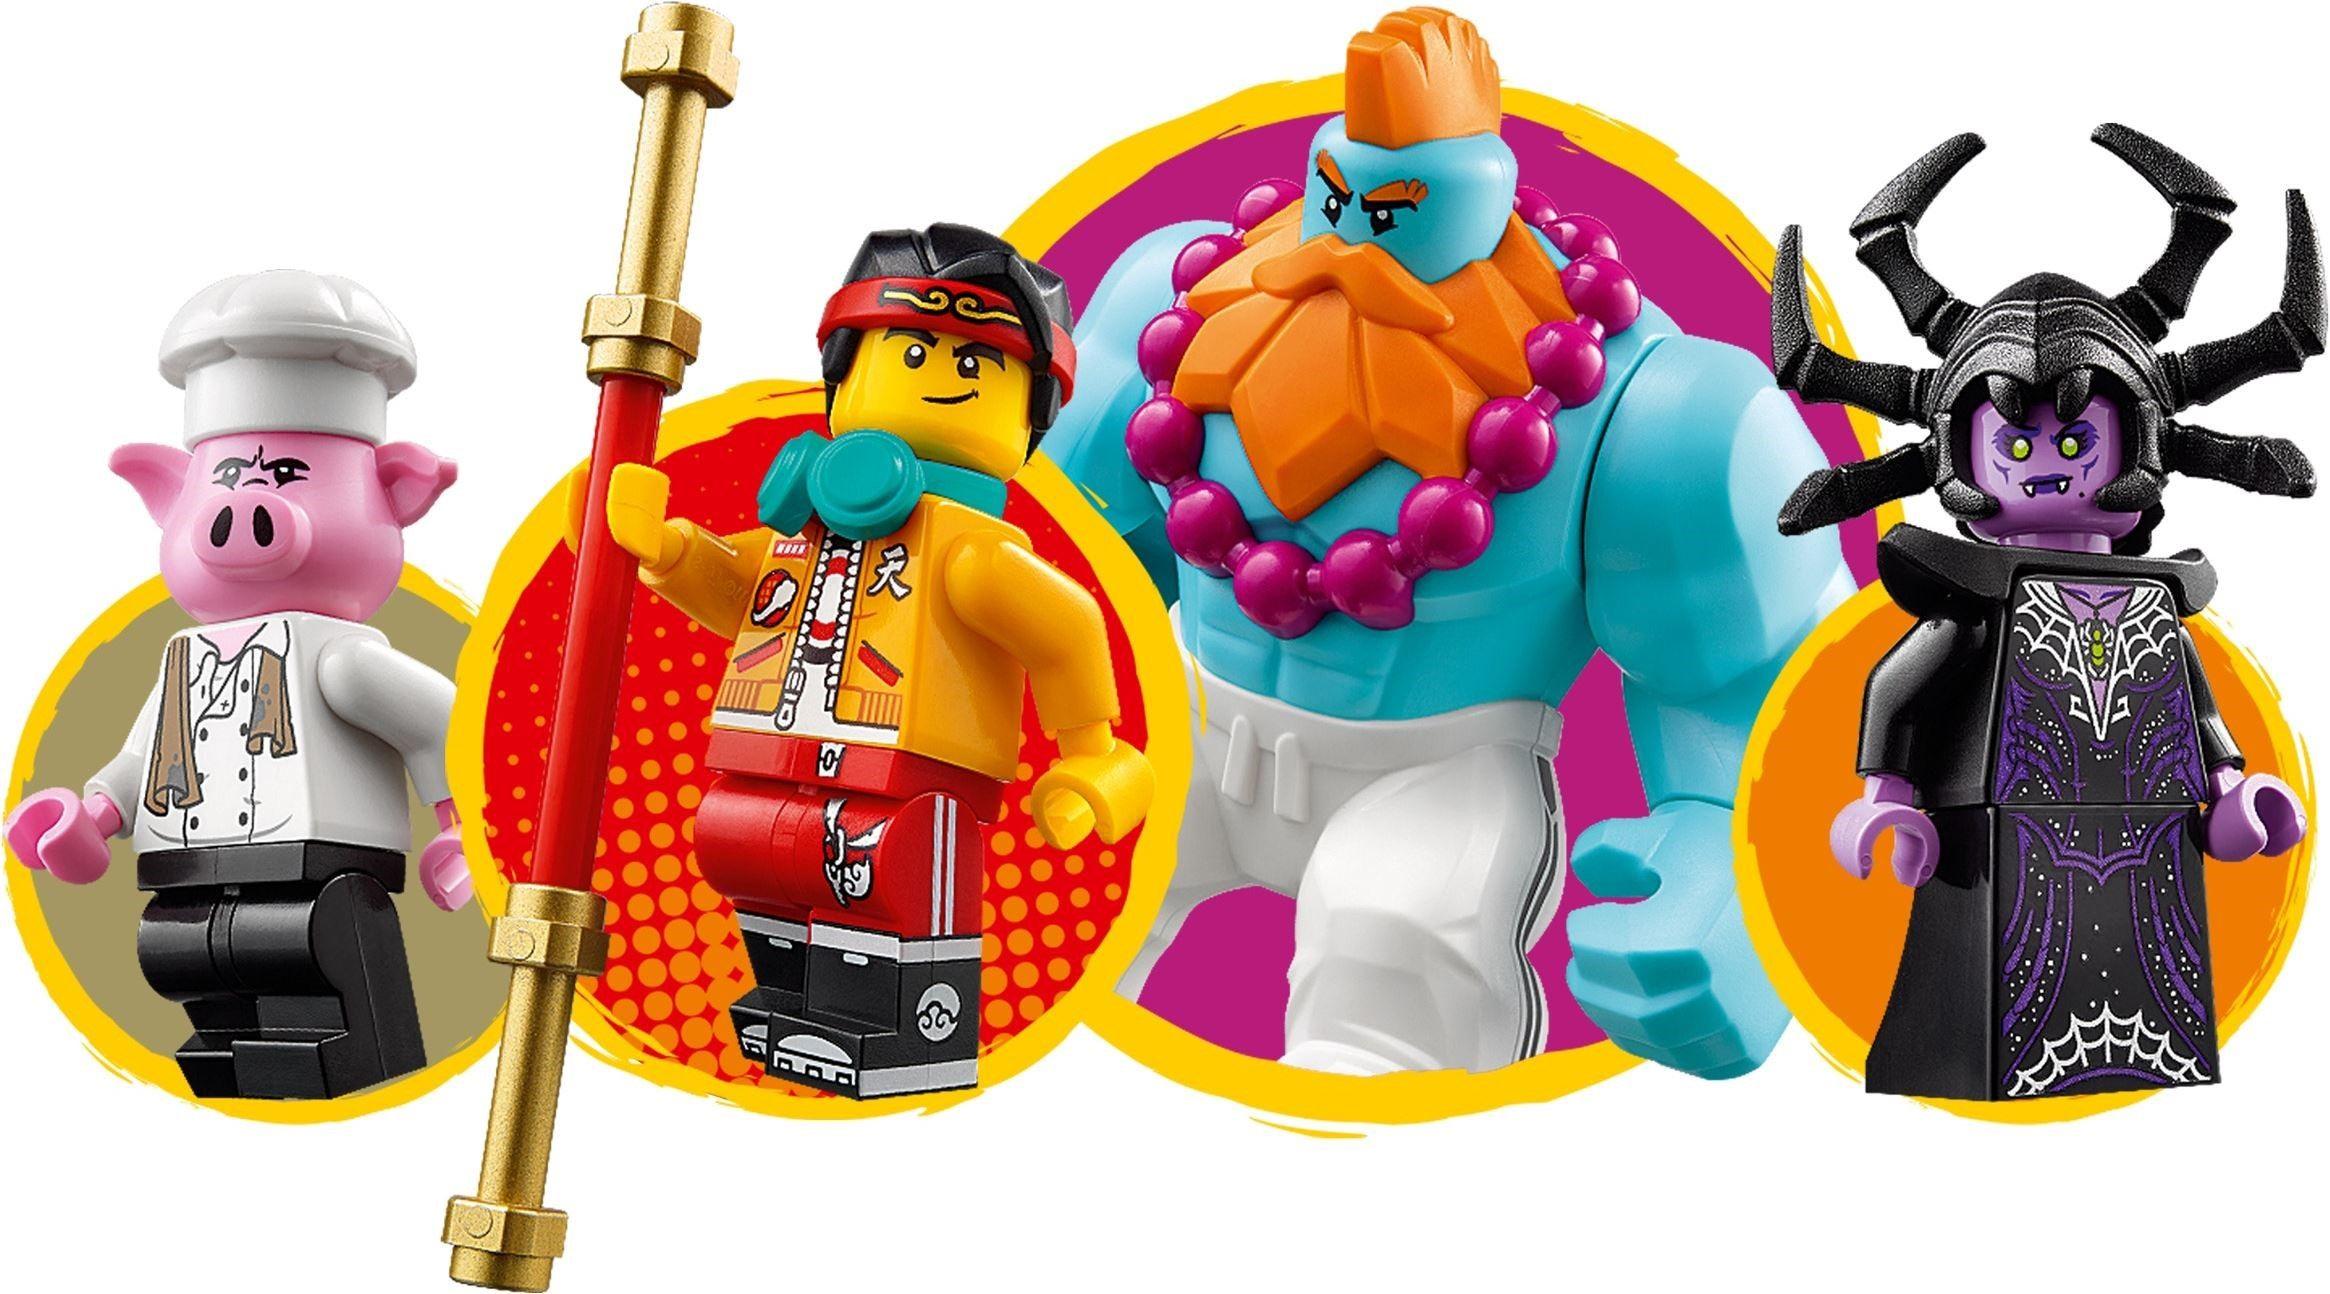 Lego 80014 Monkie Kid Sandy S Speedboat Lego Design Lego Lego News